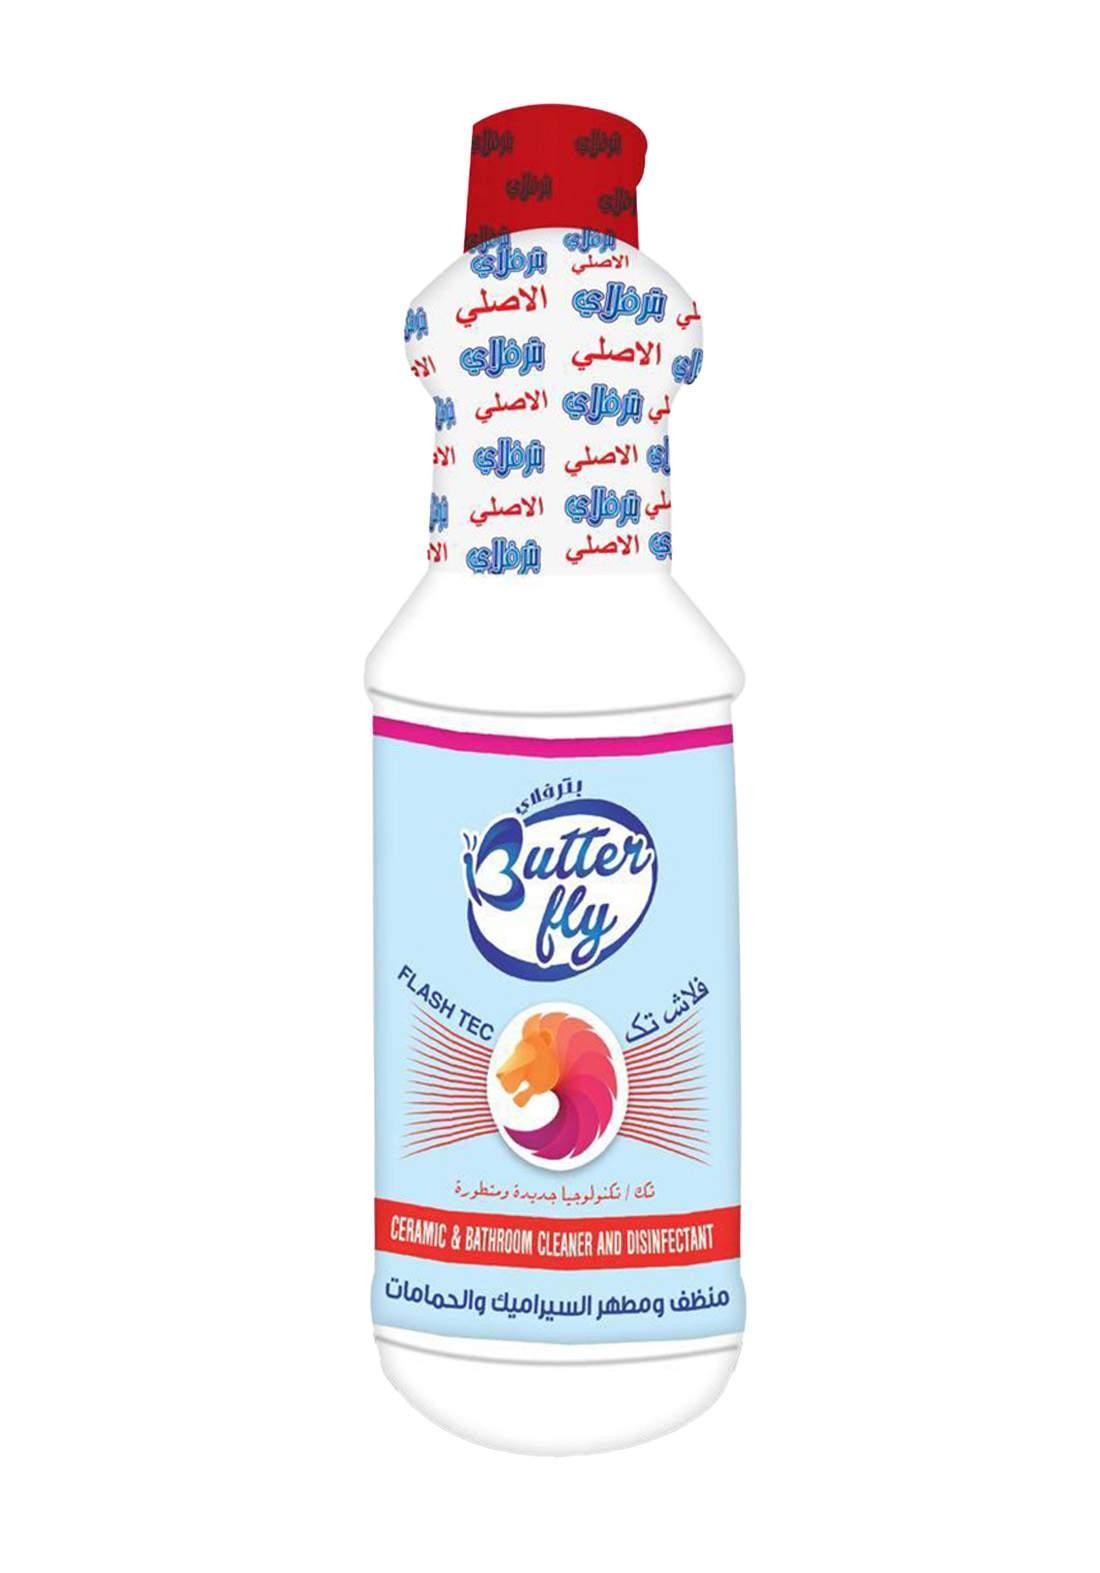 Butter Fly Flash Tec منظف ومطهر للمراحيض